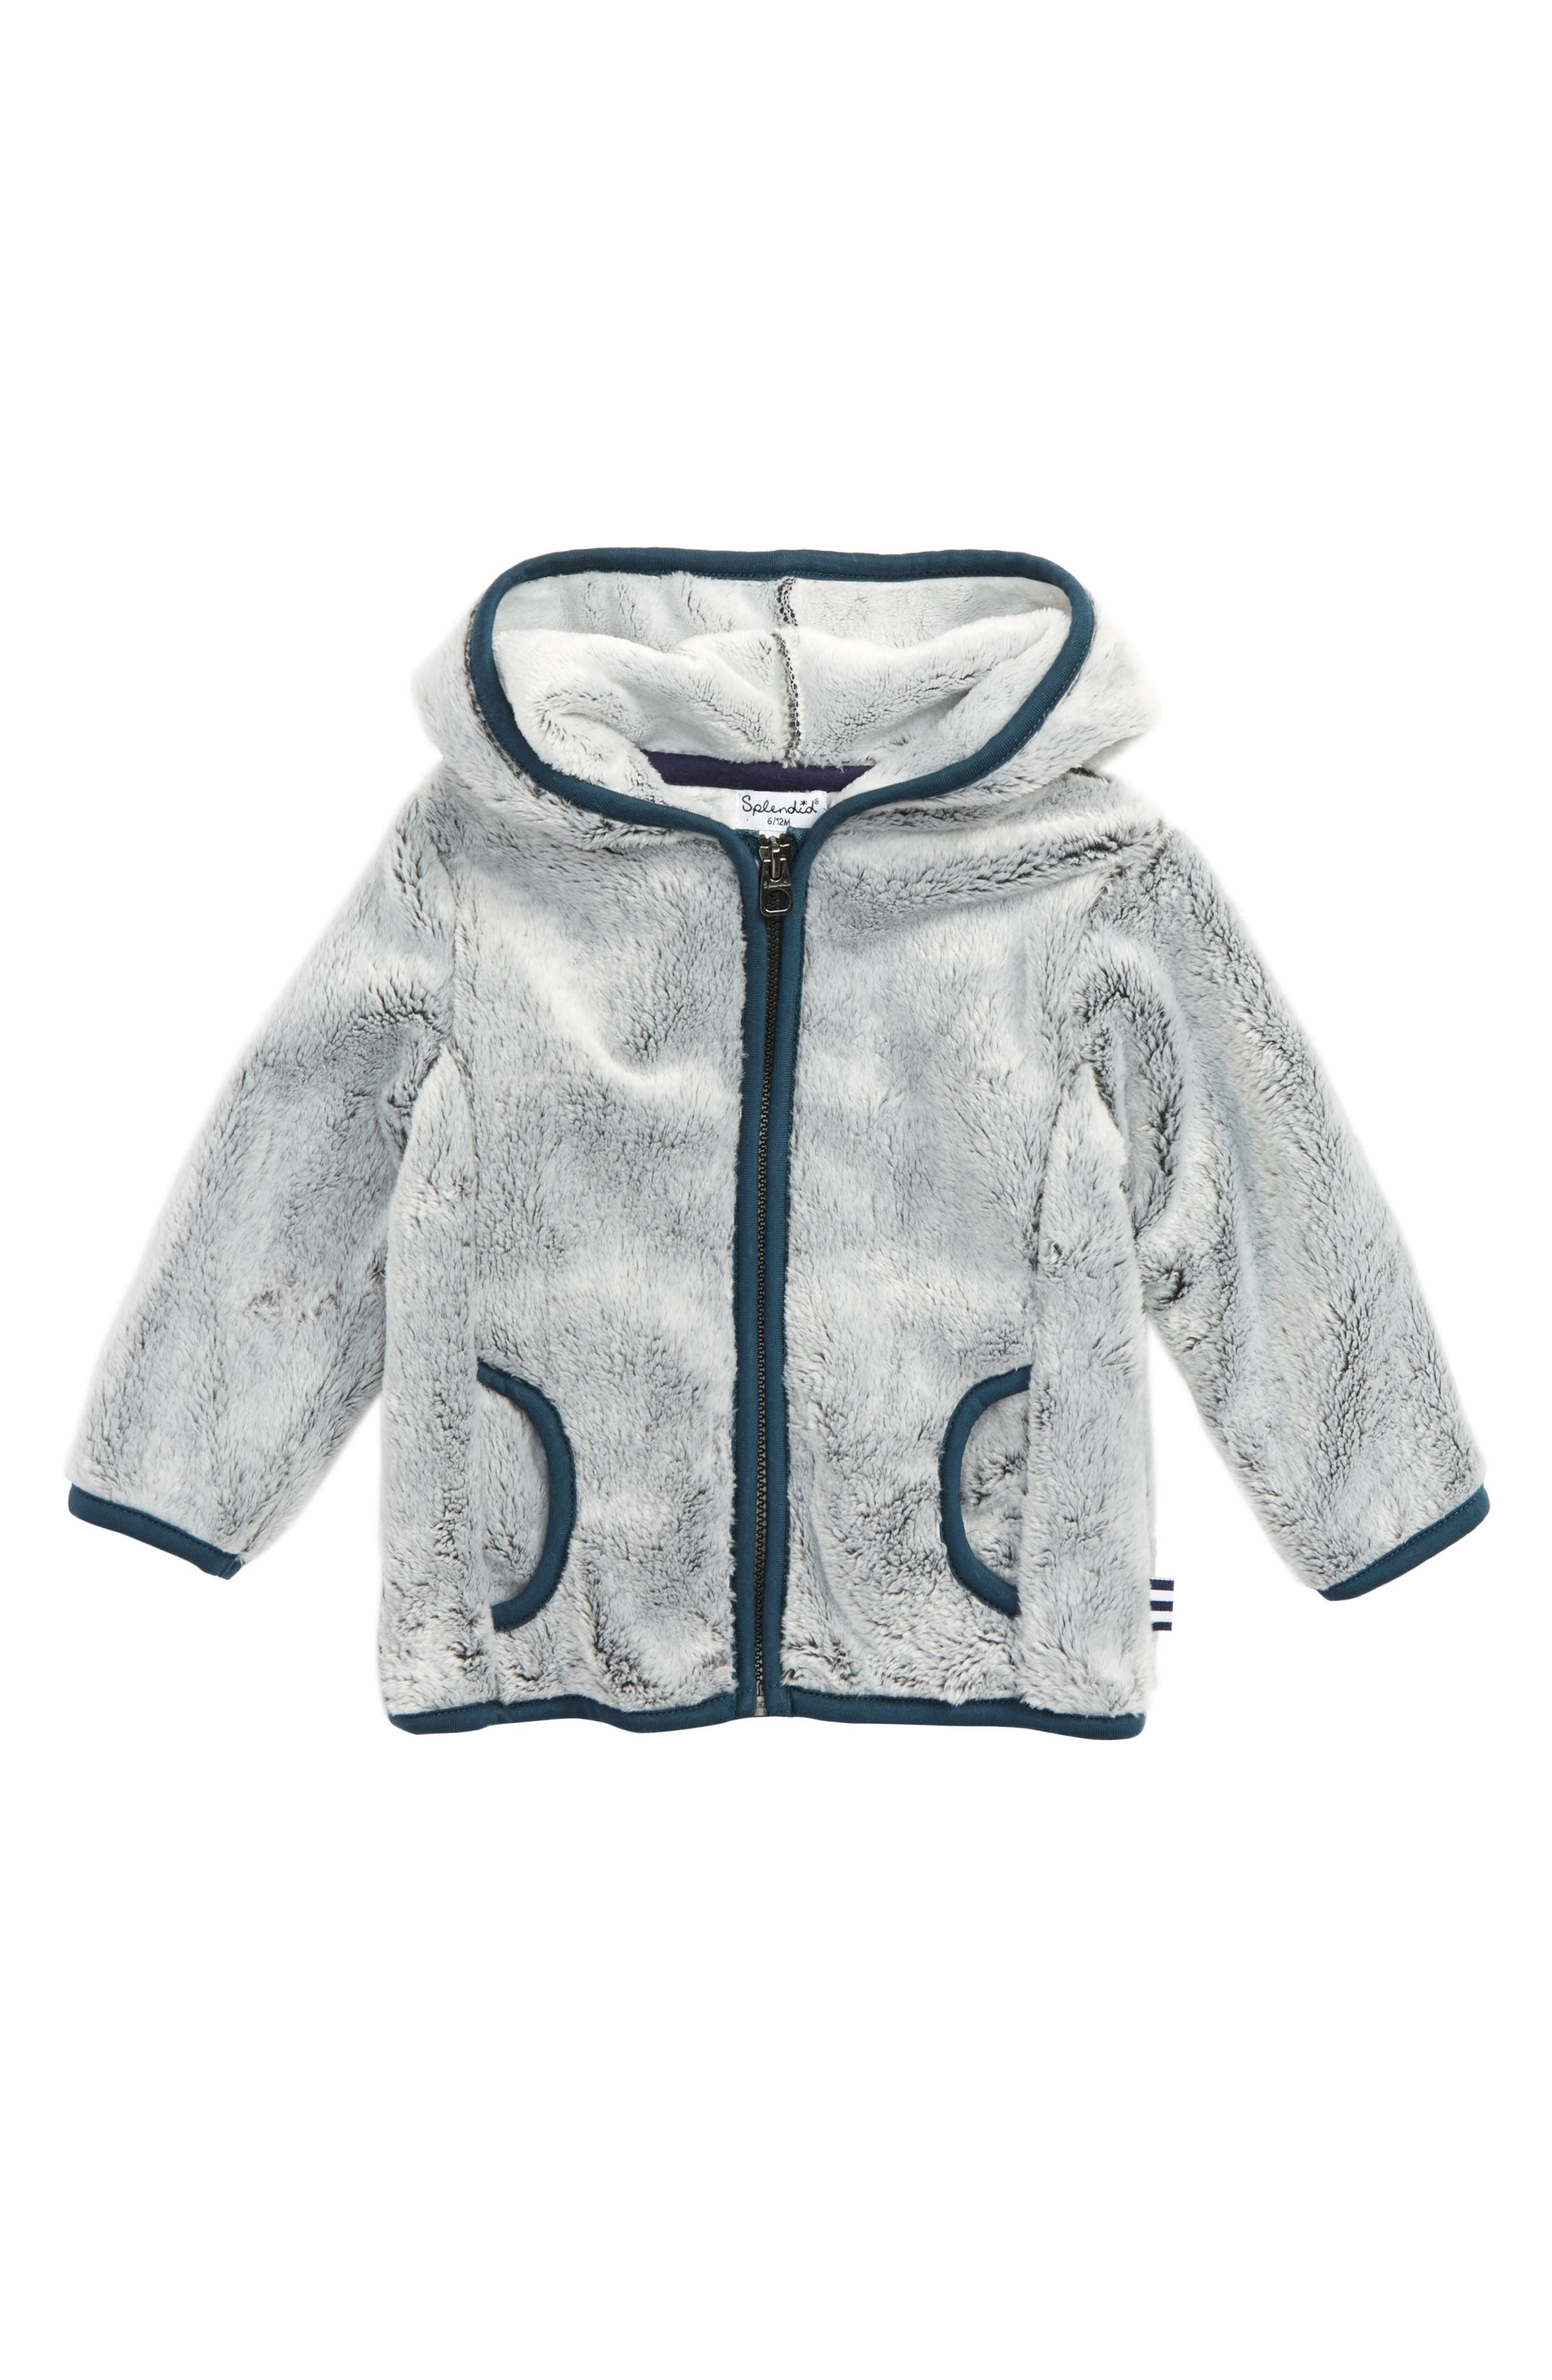 Hooded Fleece Jacket,                         Main,                         color, 031